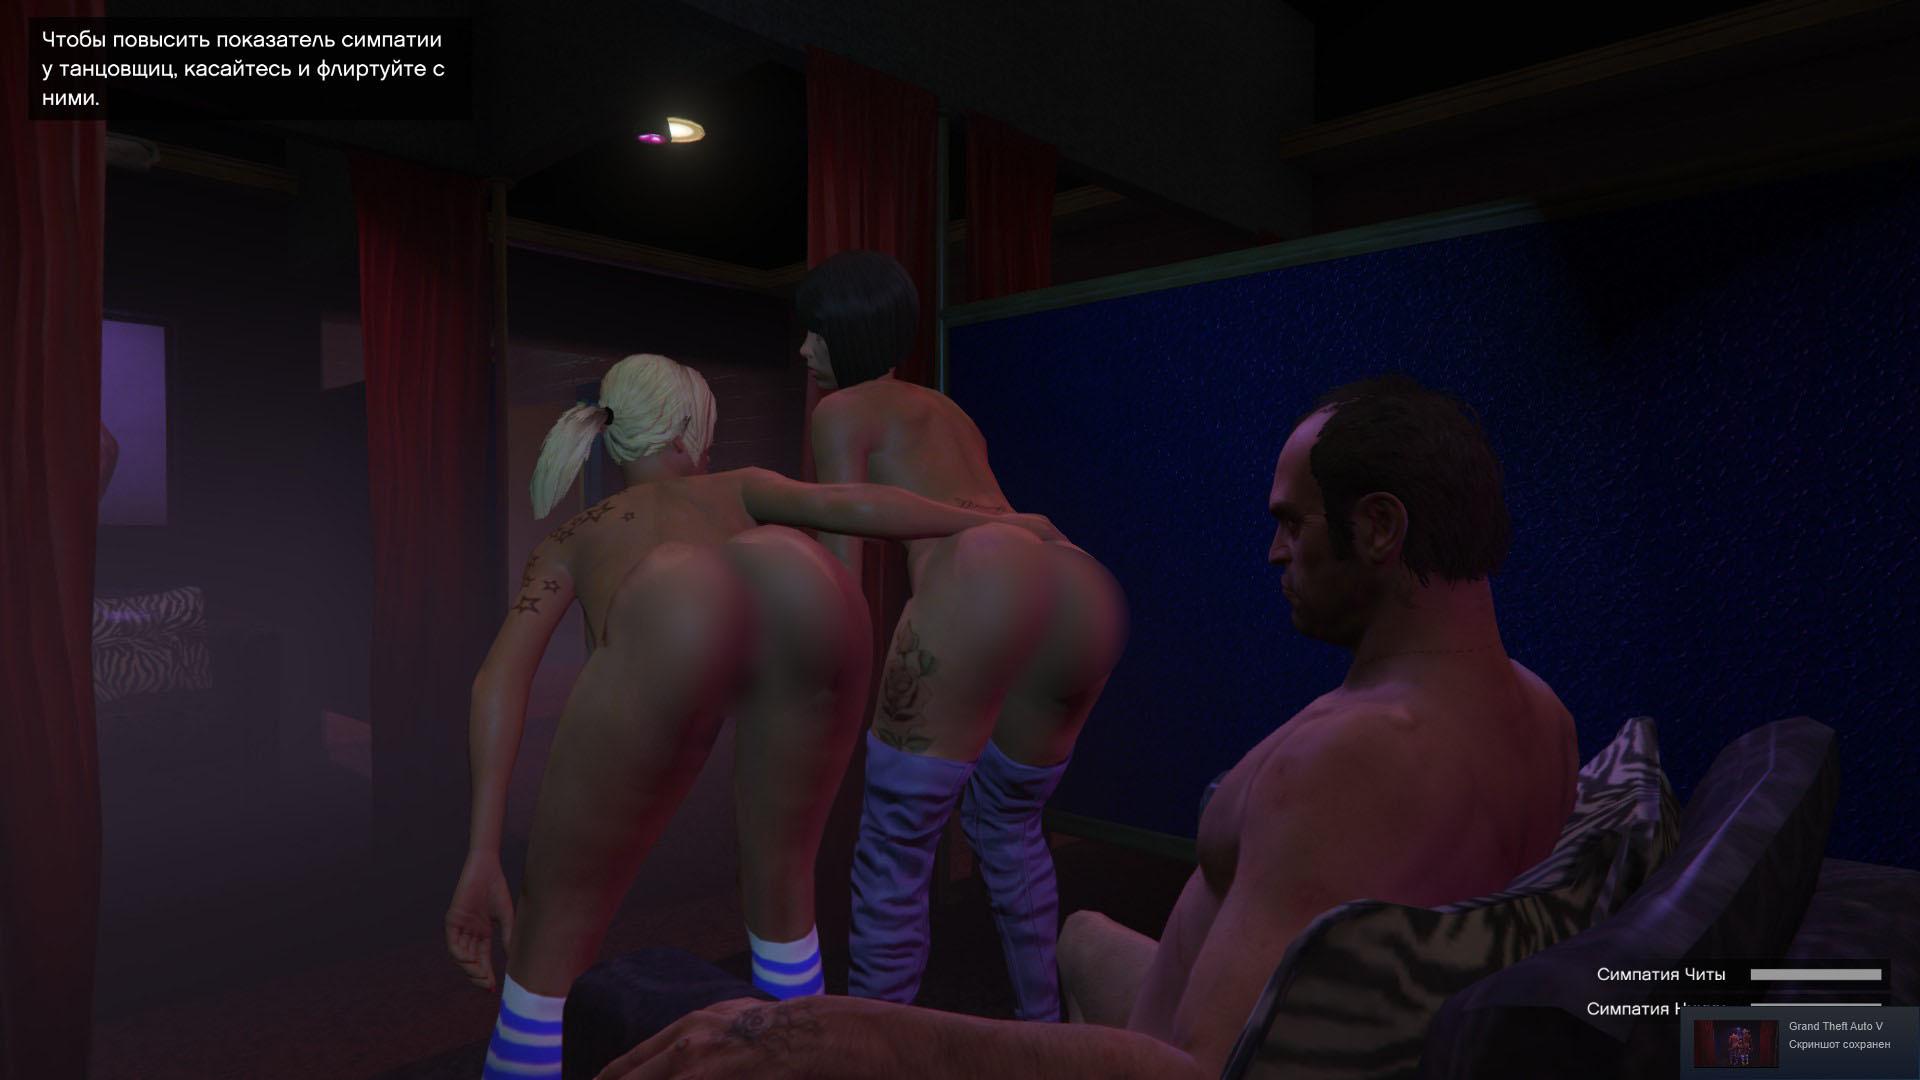 Fully nude stripper